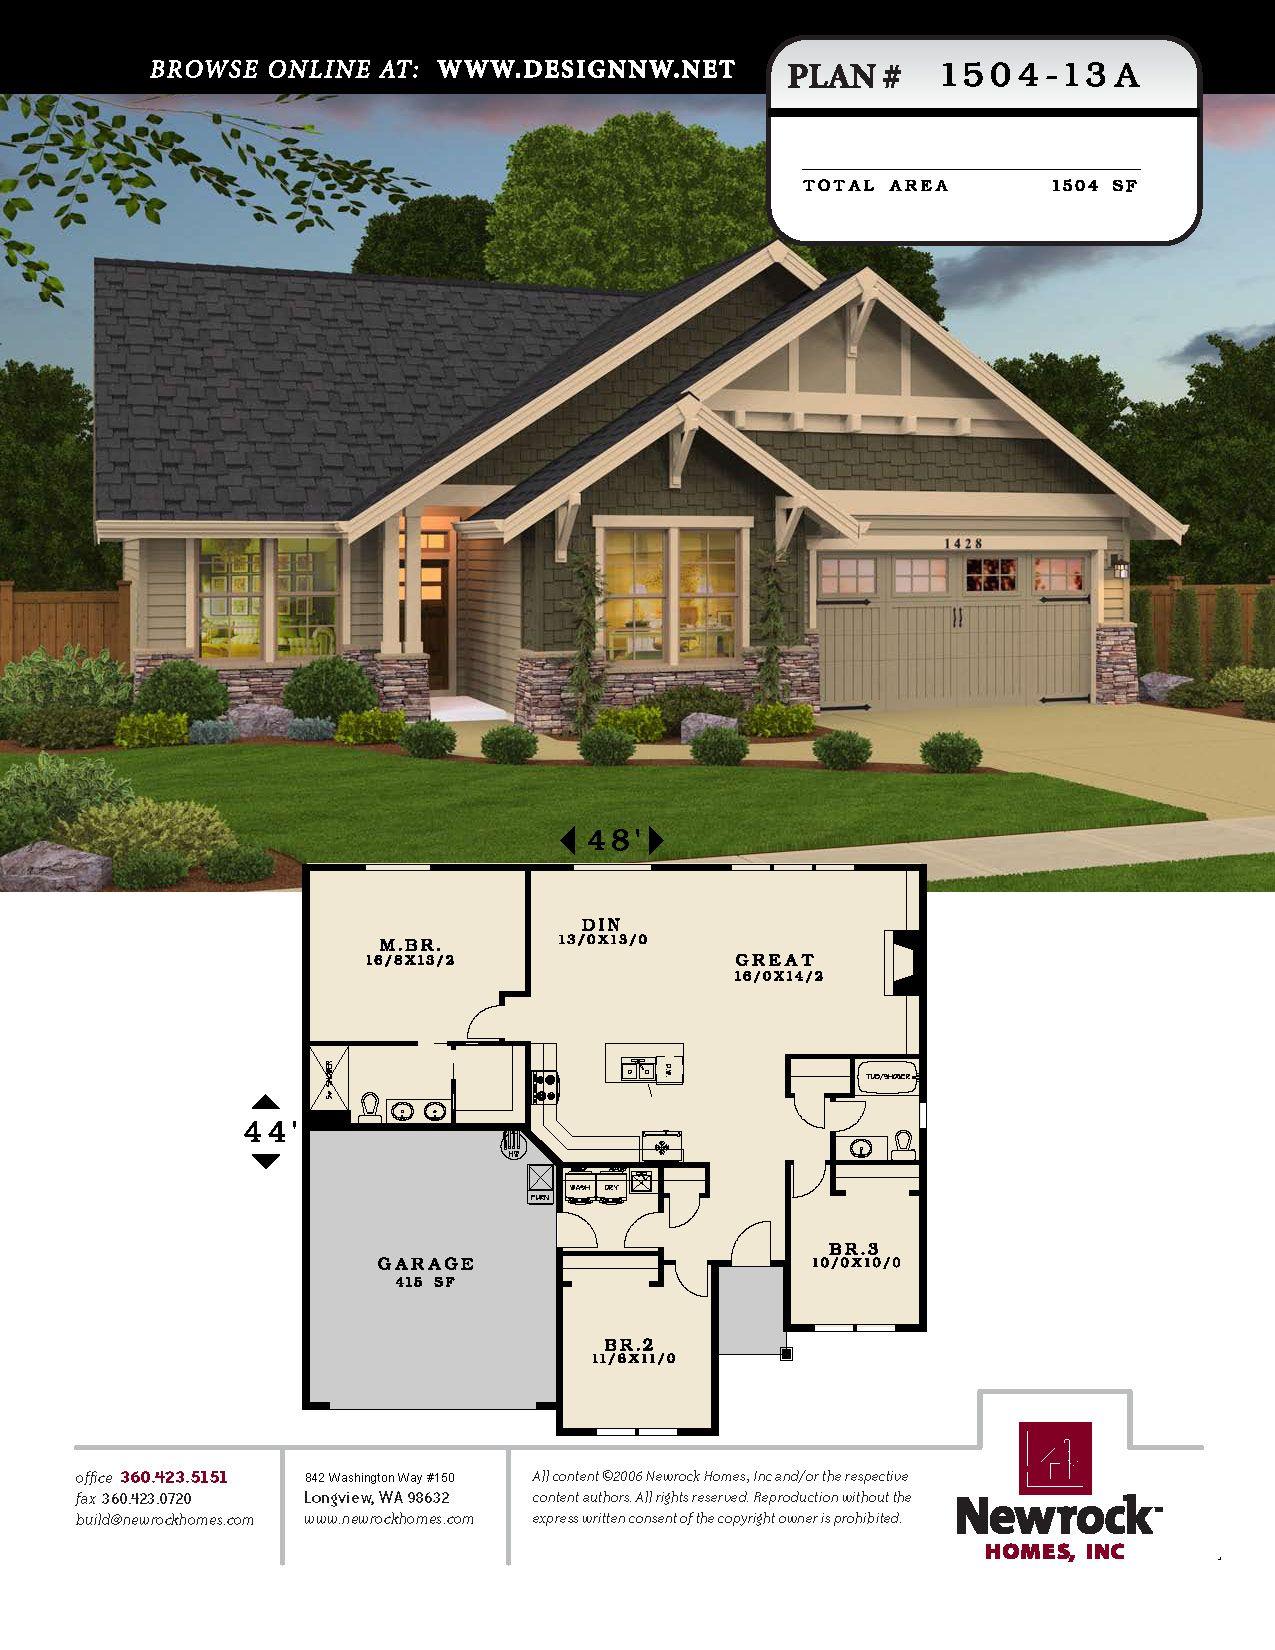 Newrock Homes Plan 1504 13a Newrock Homes Craftsman House Plans Dream House Plans House Blueprints